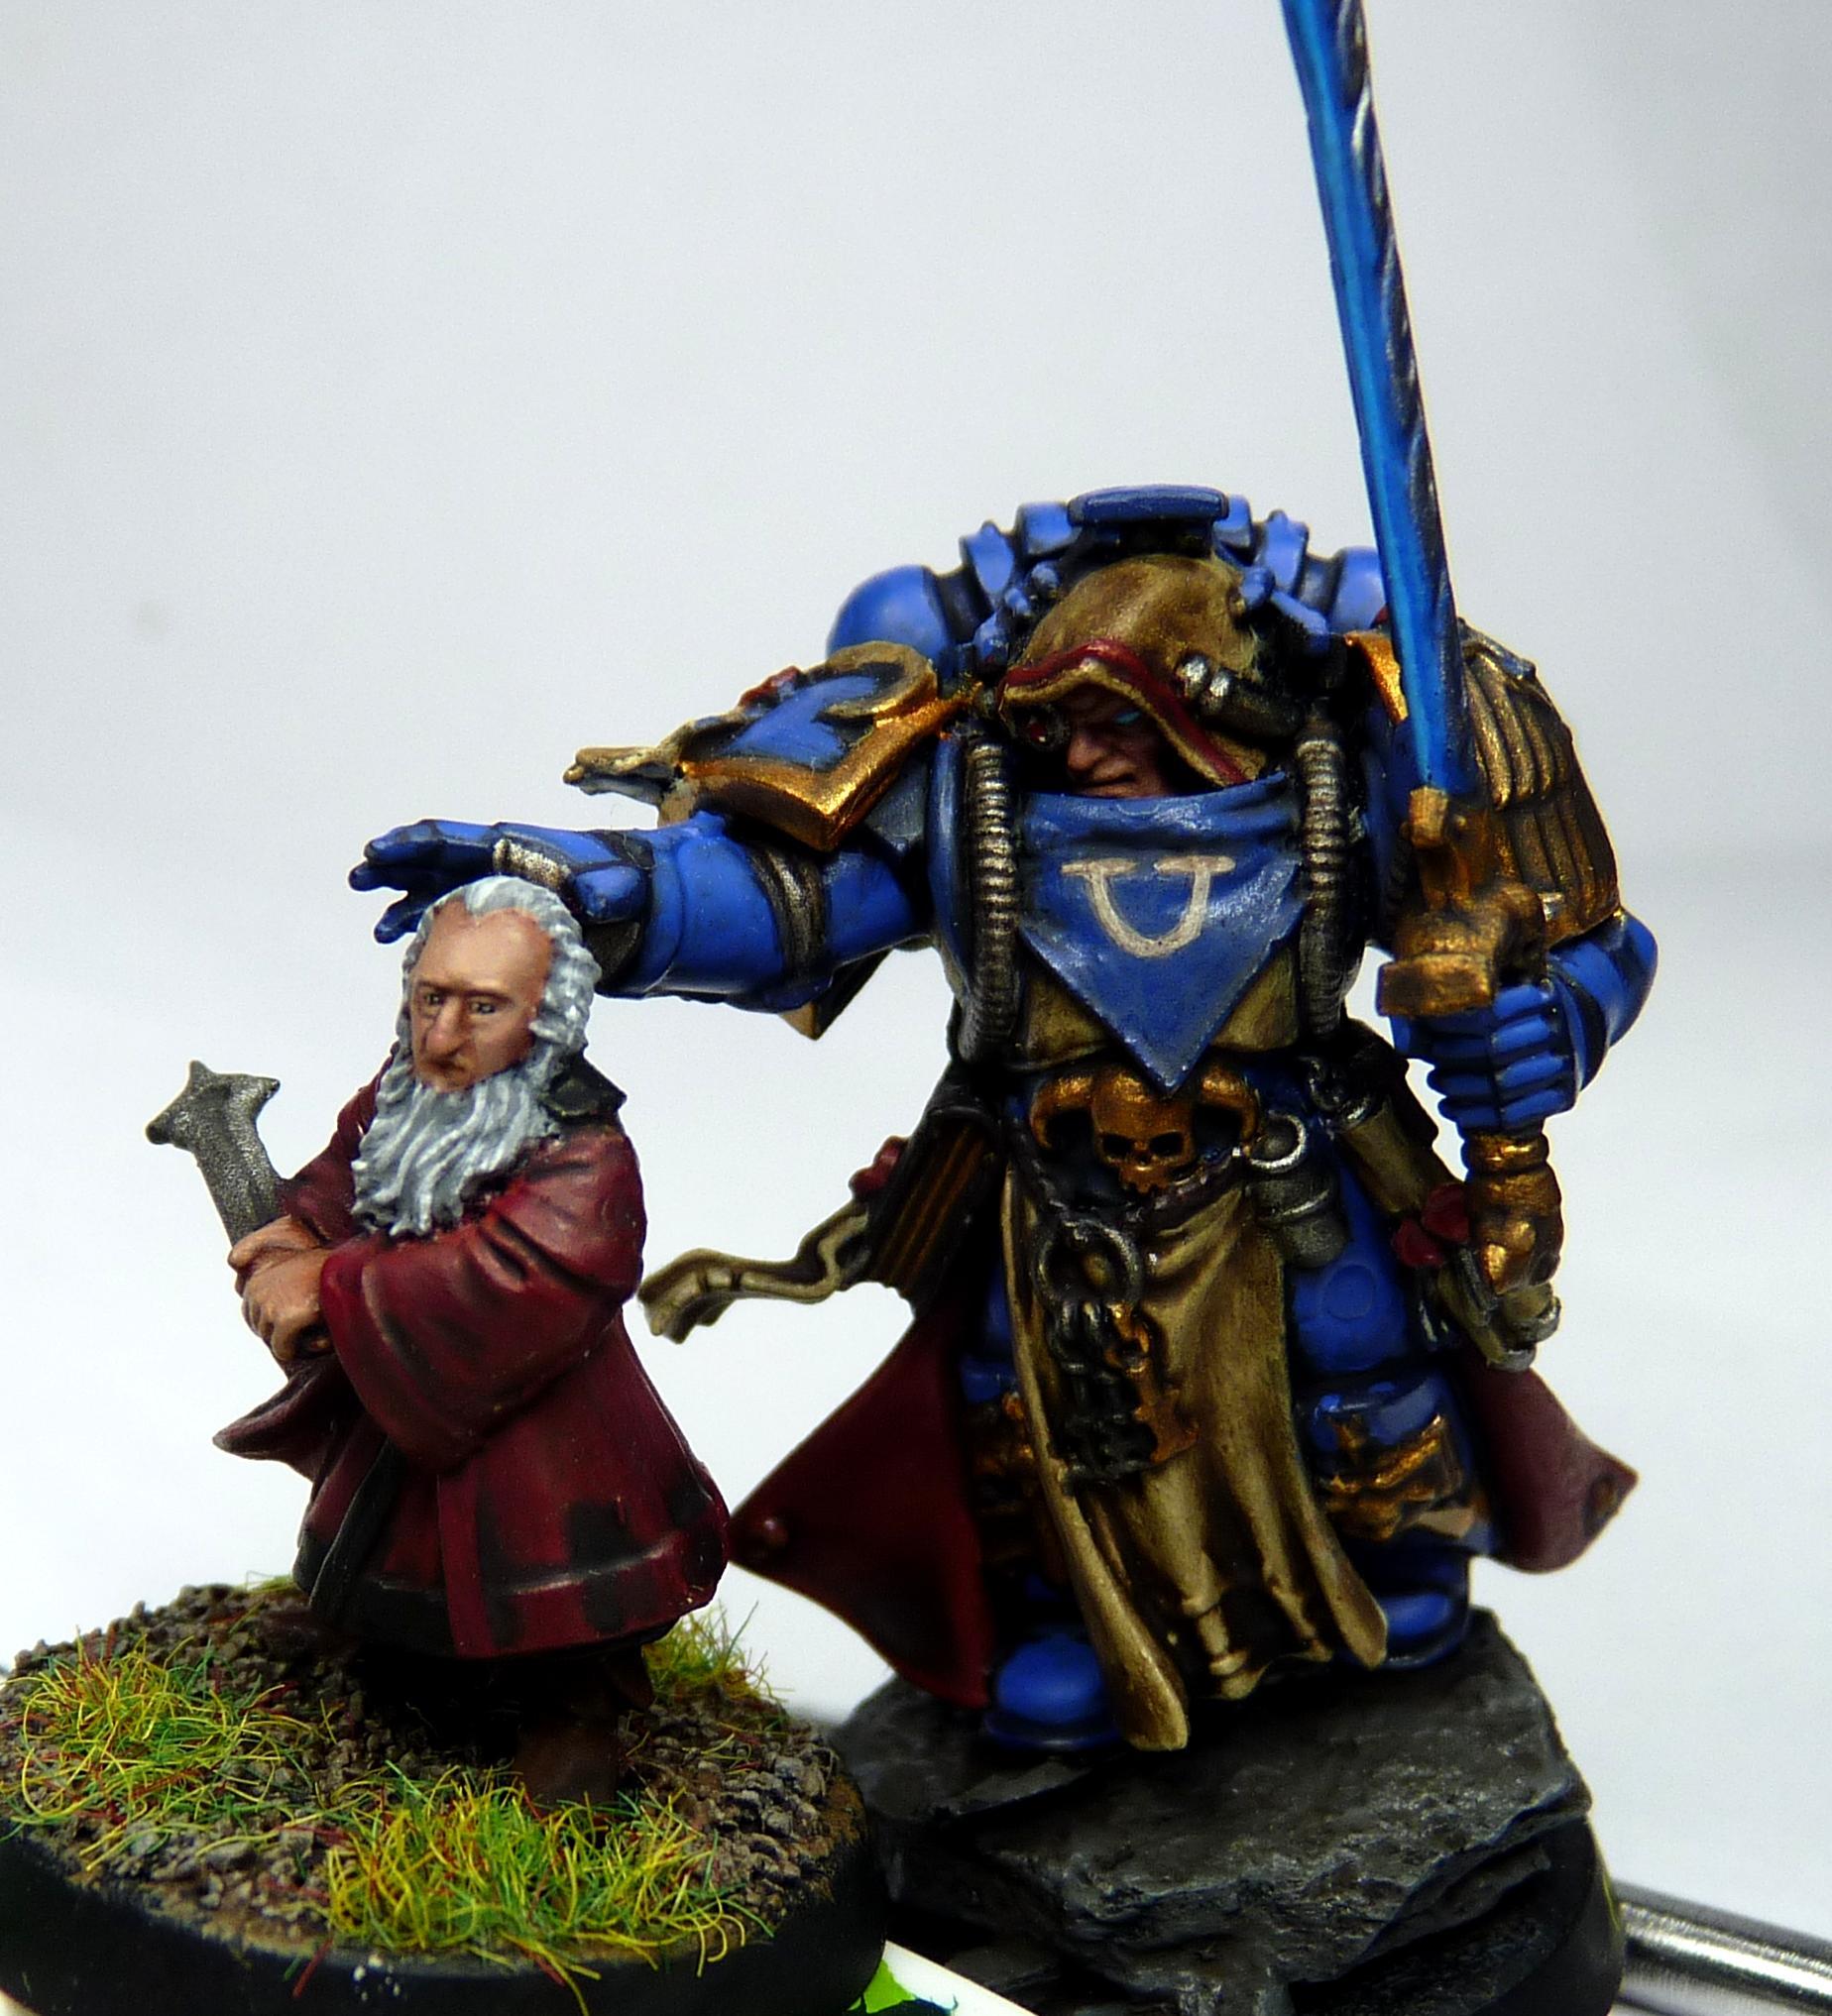 Balin, Dwarves, Librarian, The Hobbit